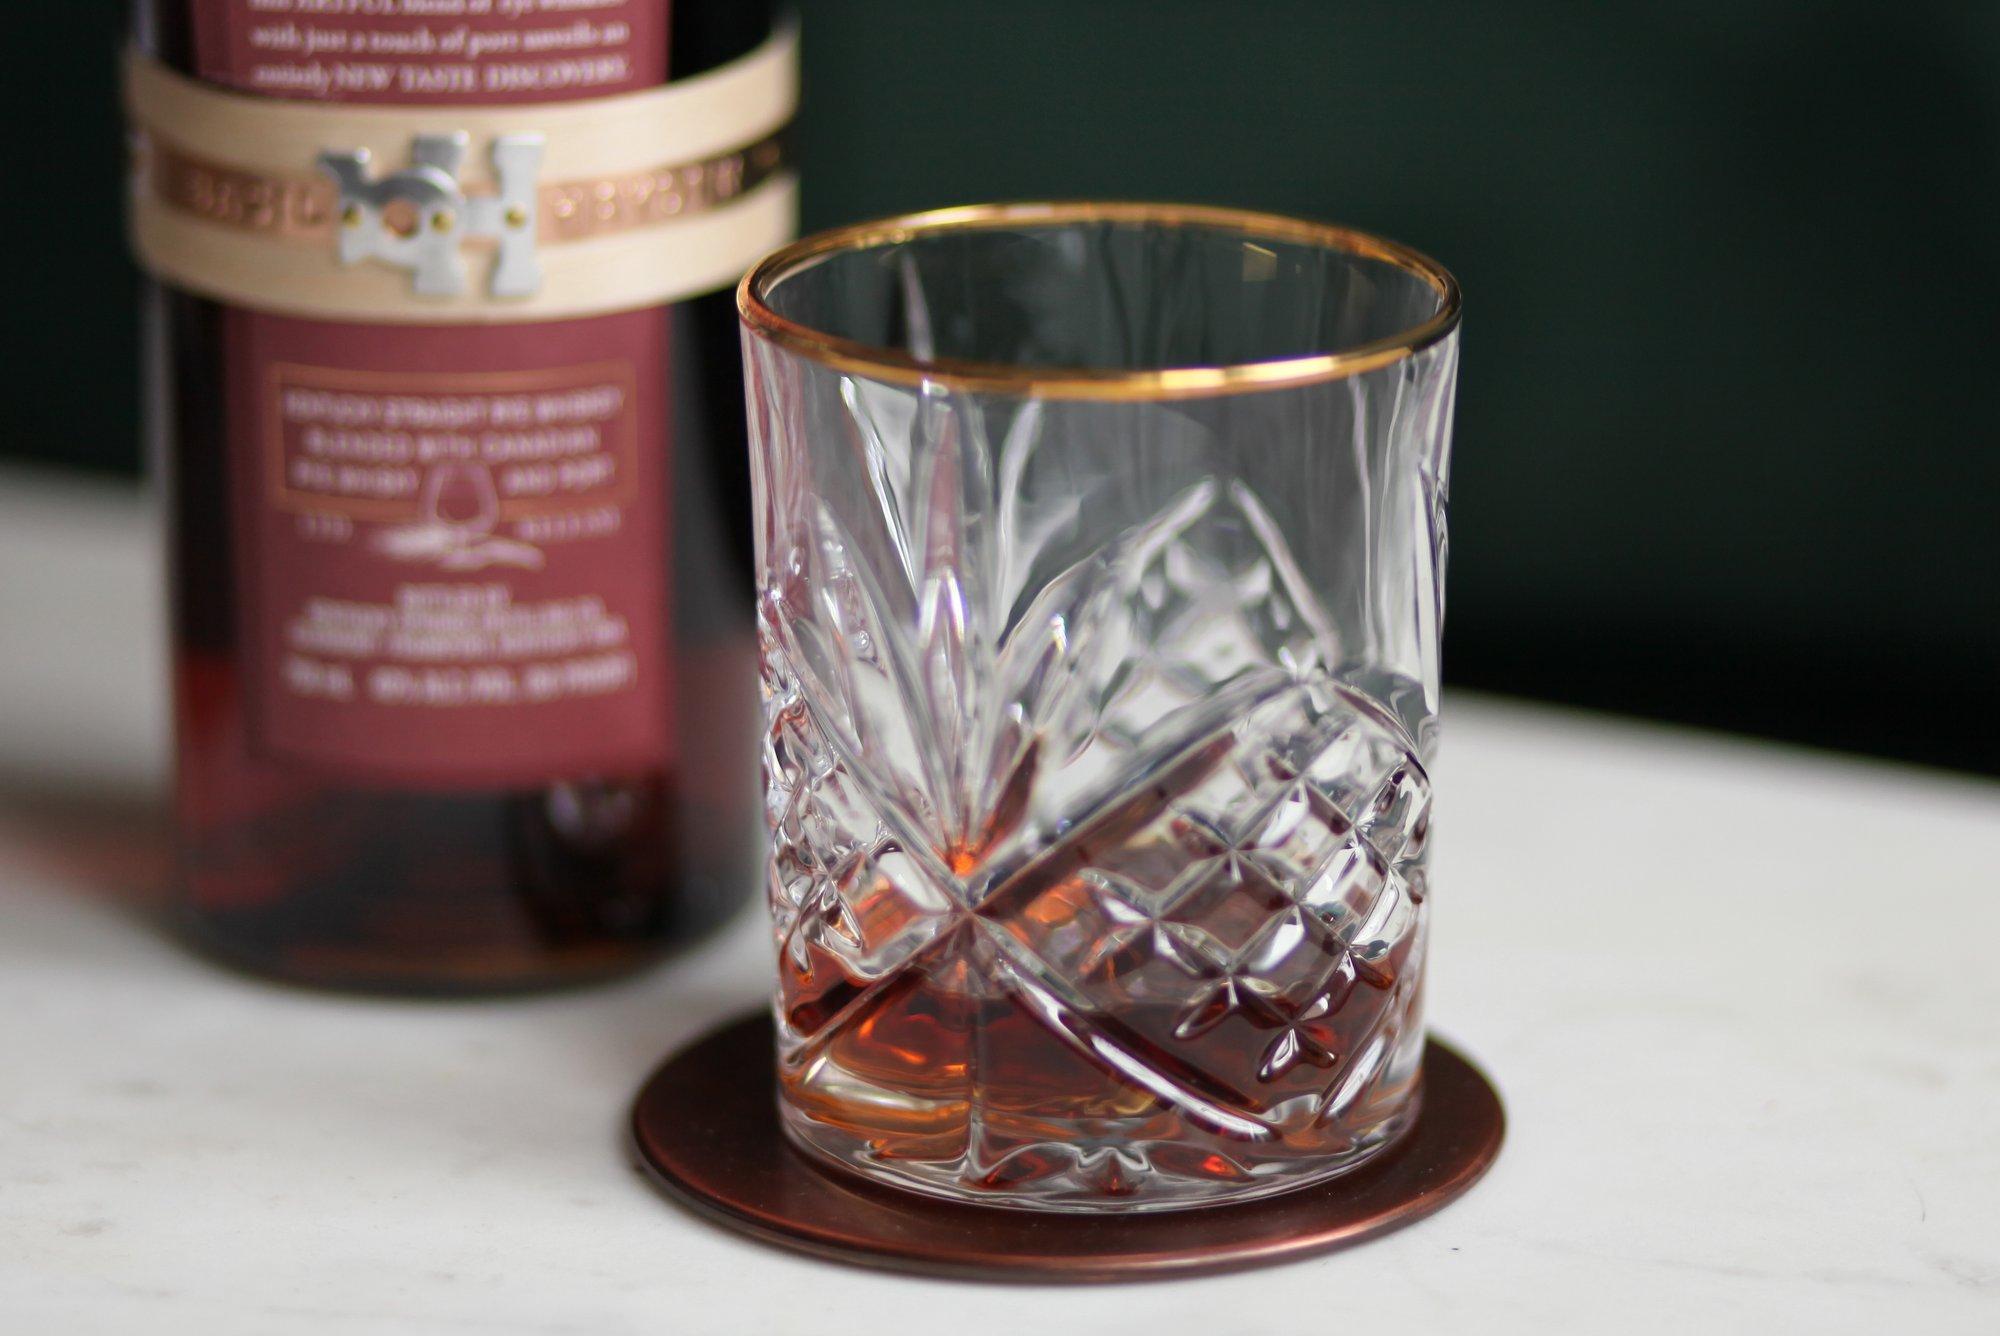 Basil Haydens Dark Rye in glass